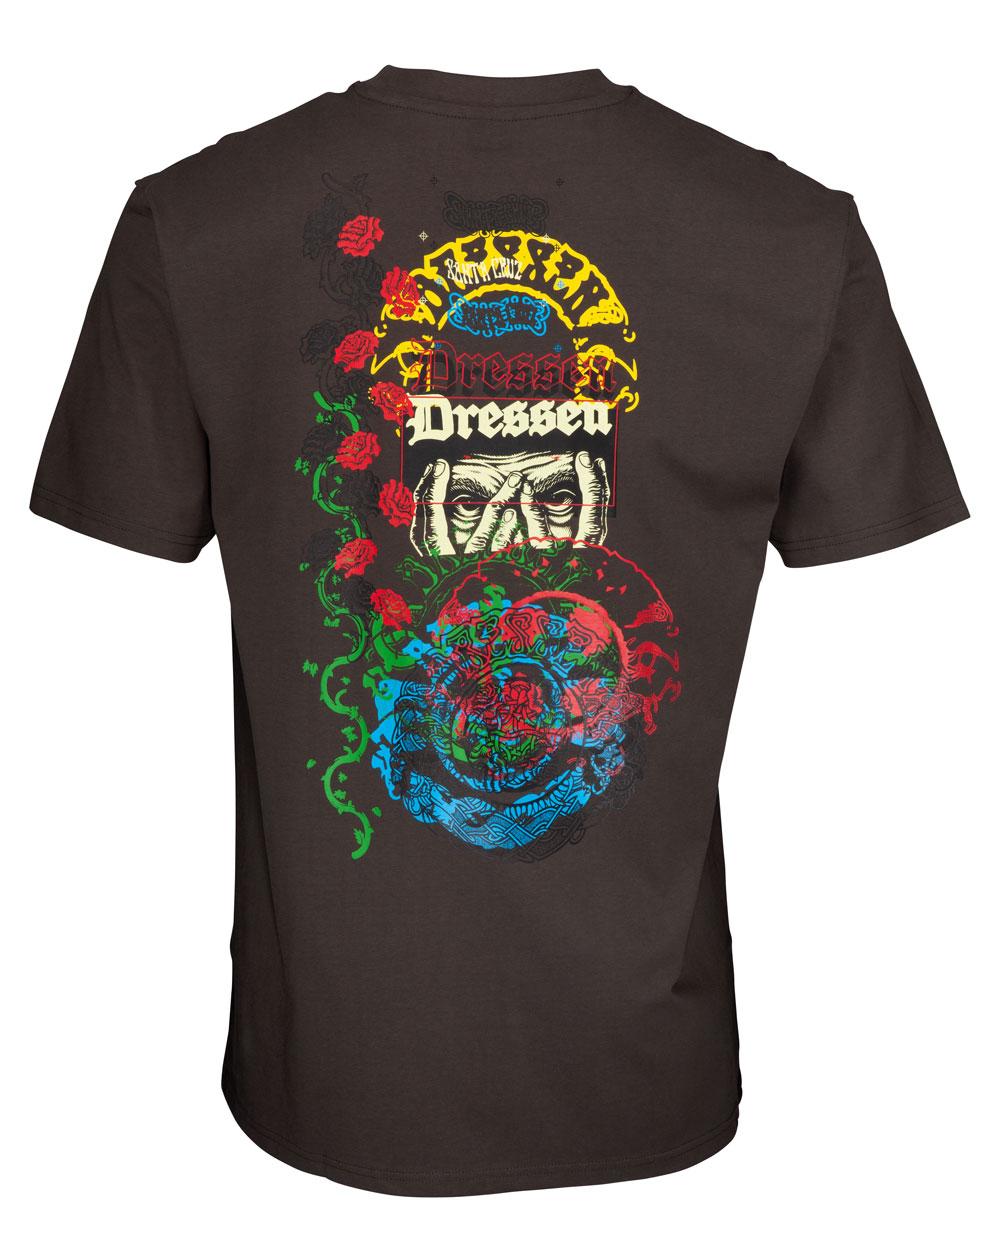 Santa Cruz Dressen Archive Camiseta para Hombre Washed Black